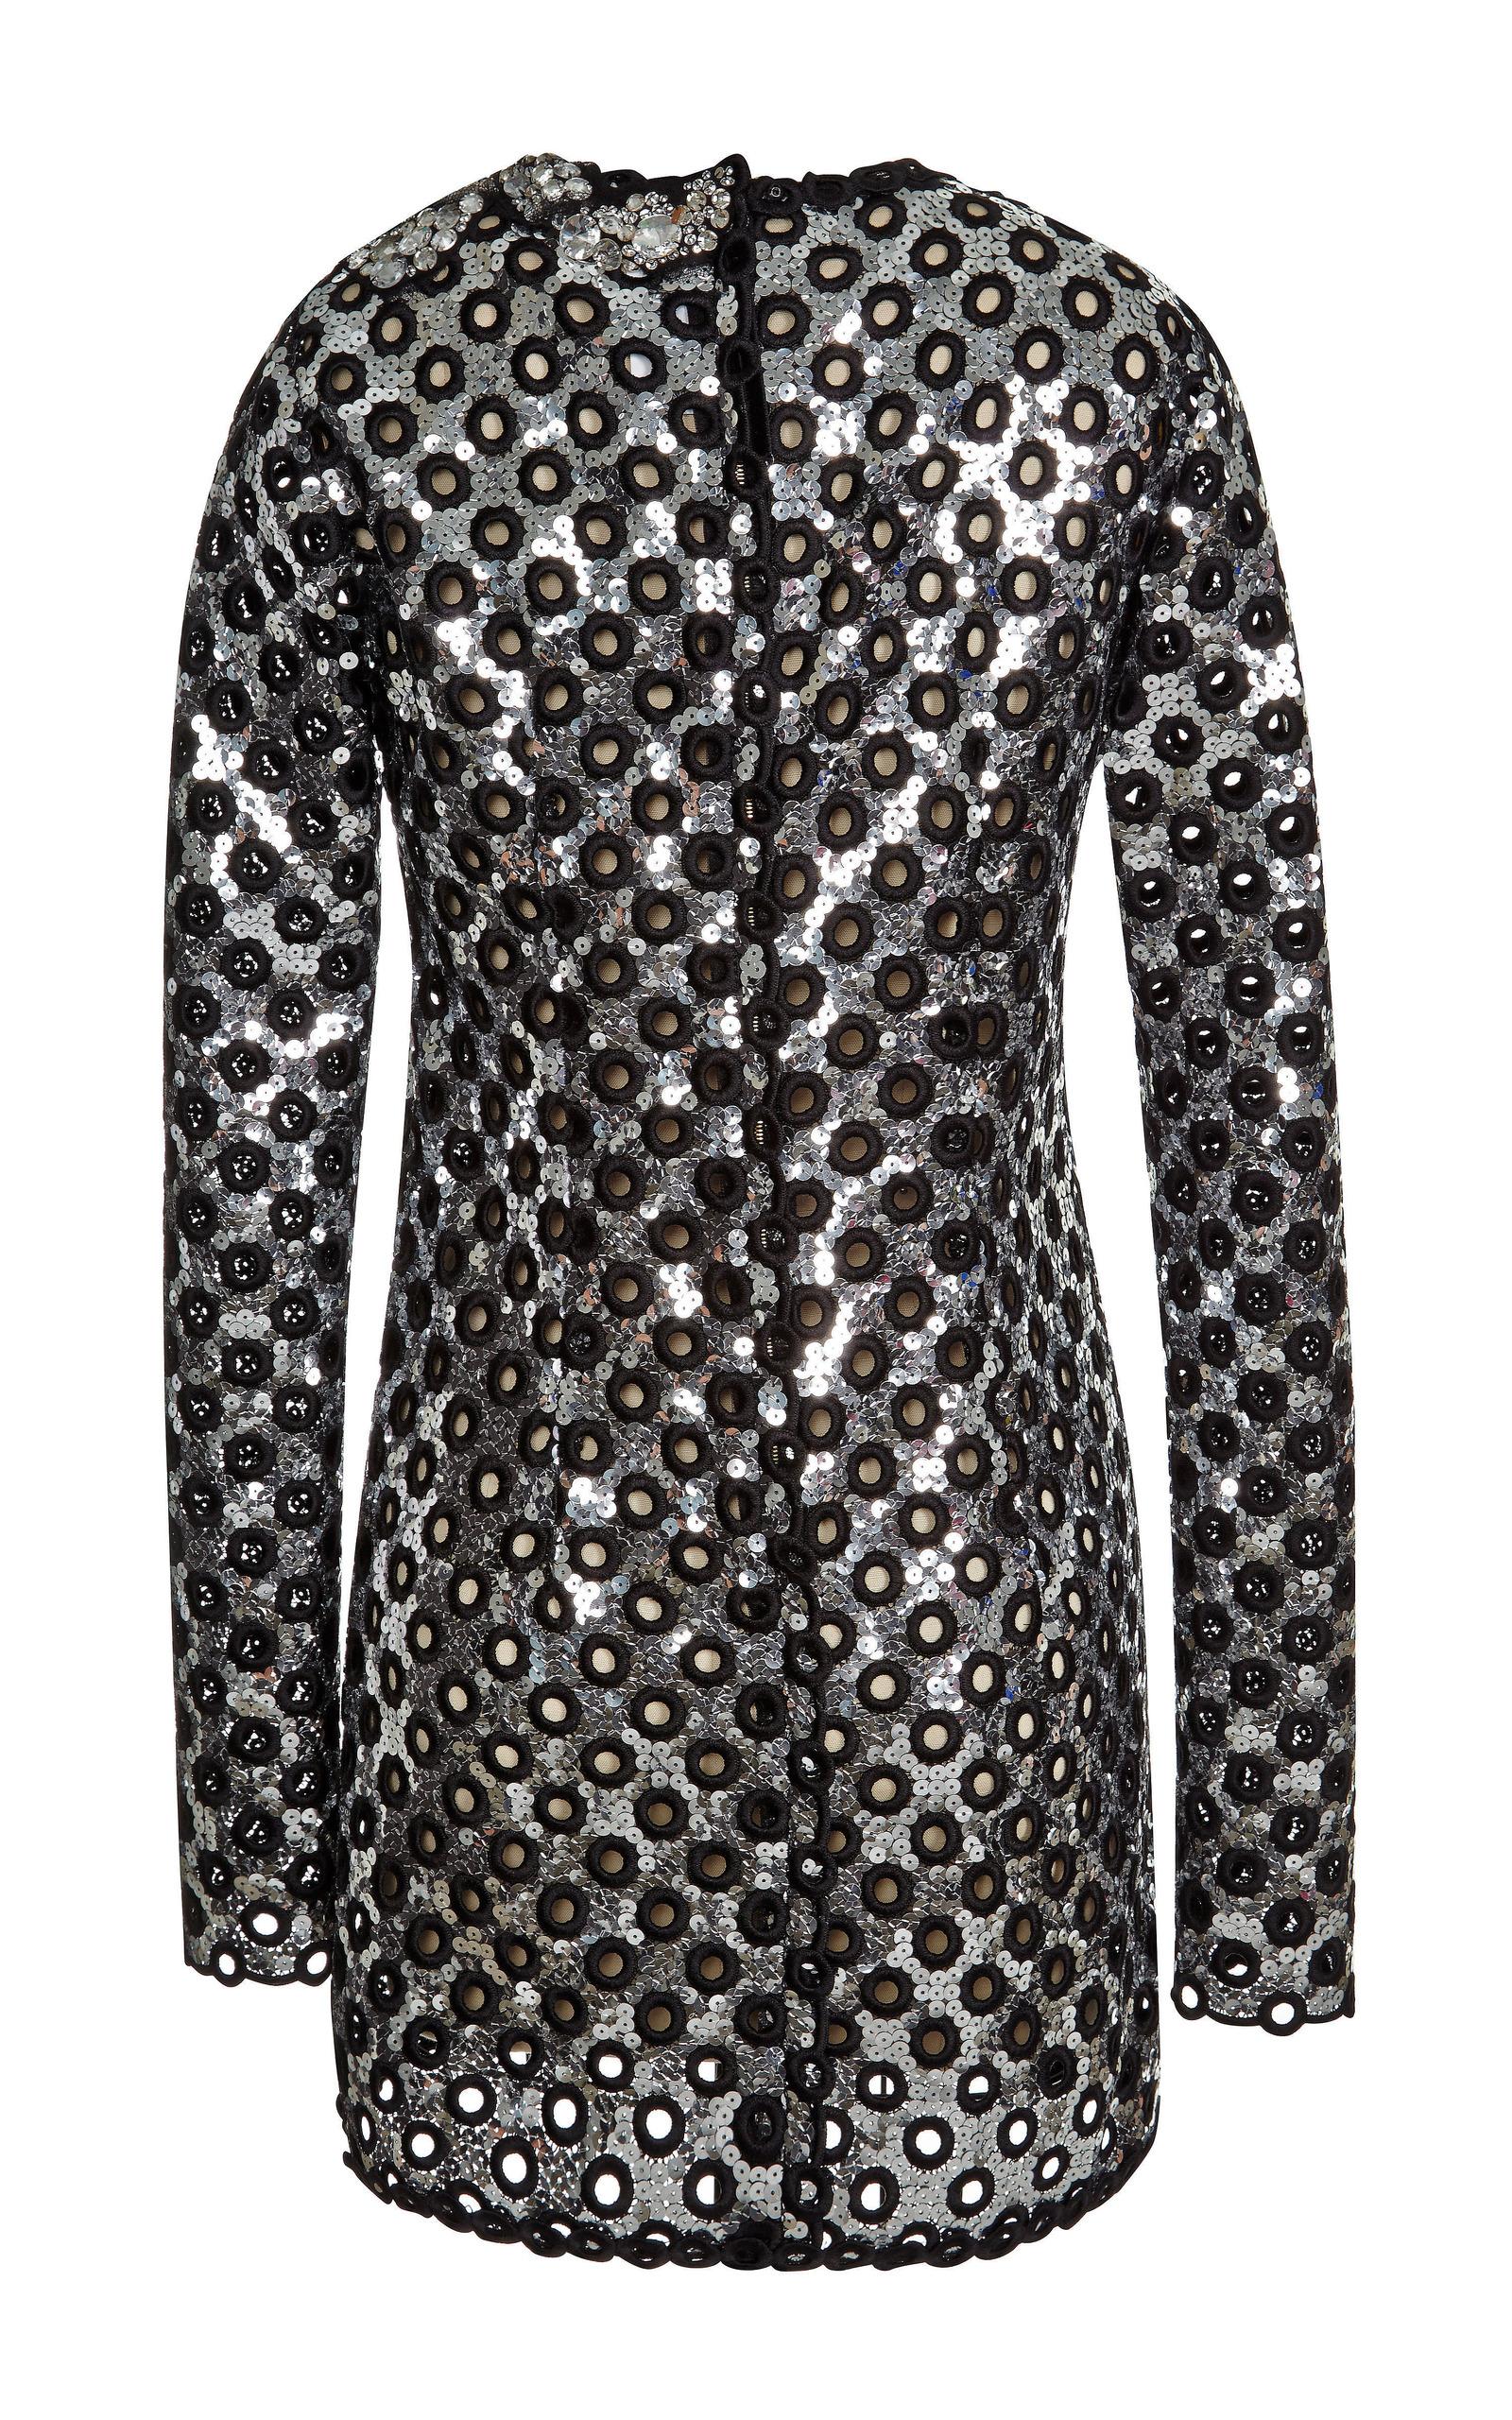 Oversized Sequin Dress